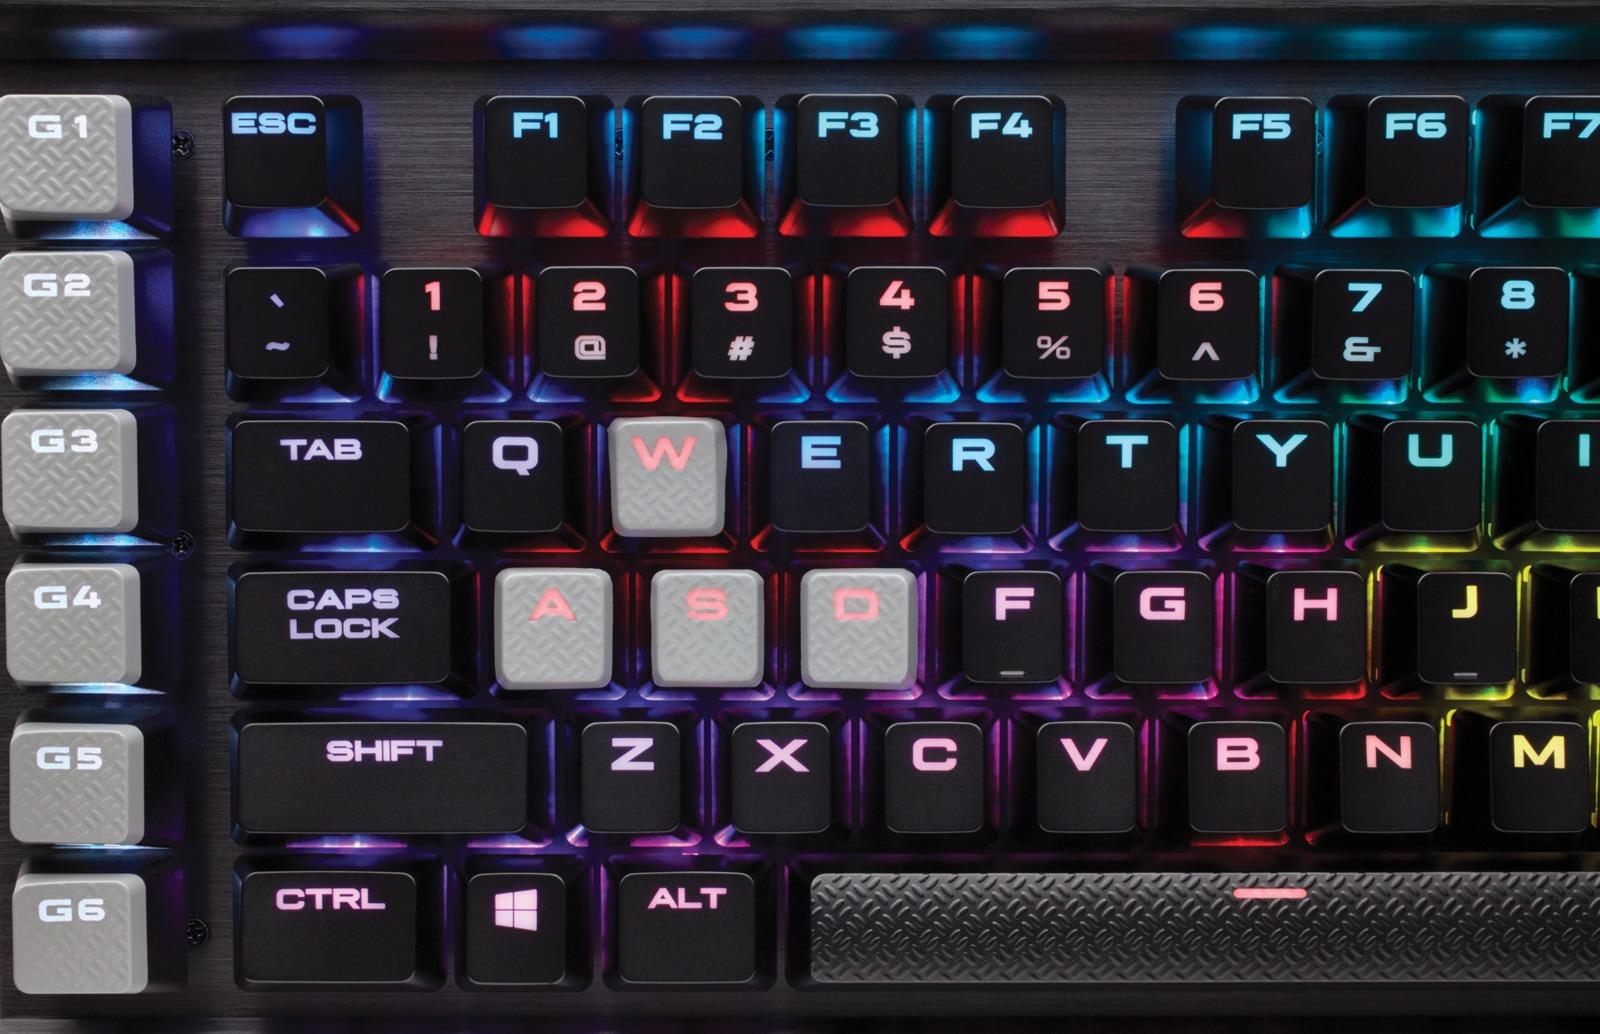 Corsair K95 RGB Platinum Gaming Keyboard (Cherry MX Speed) for PC Games image